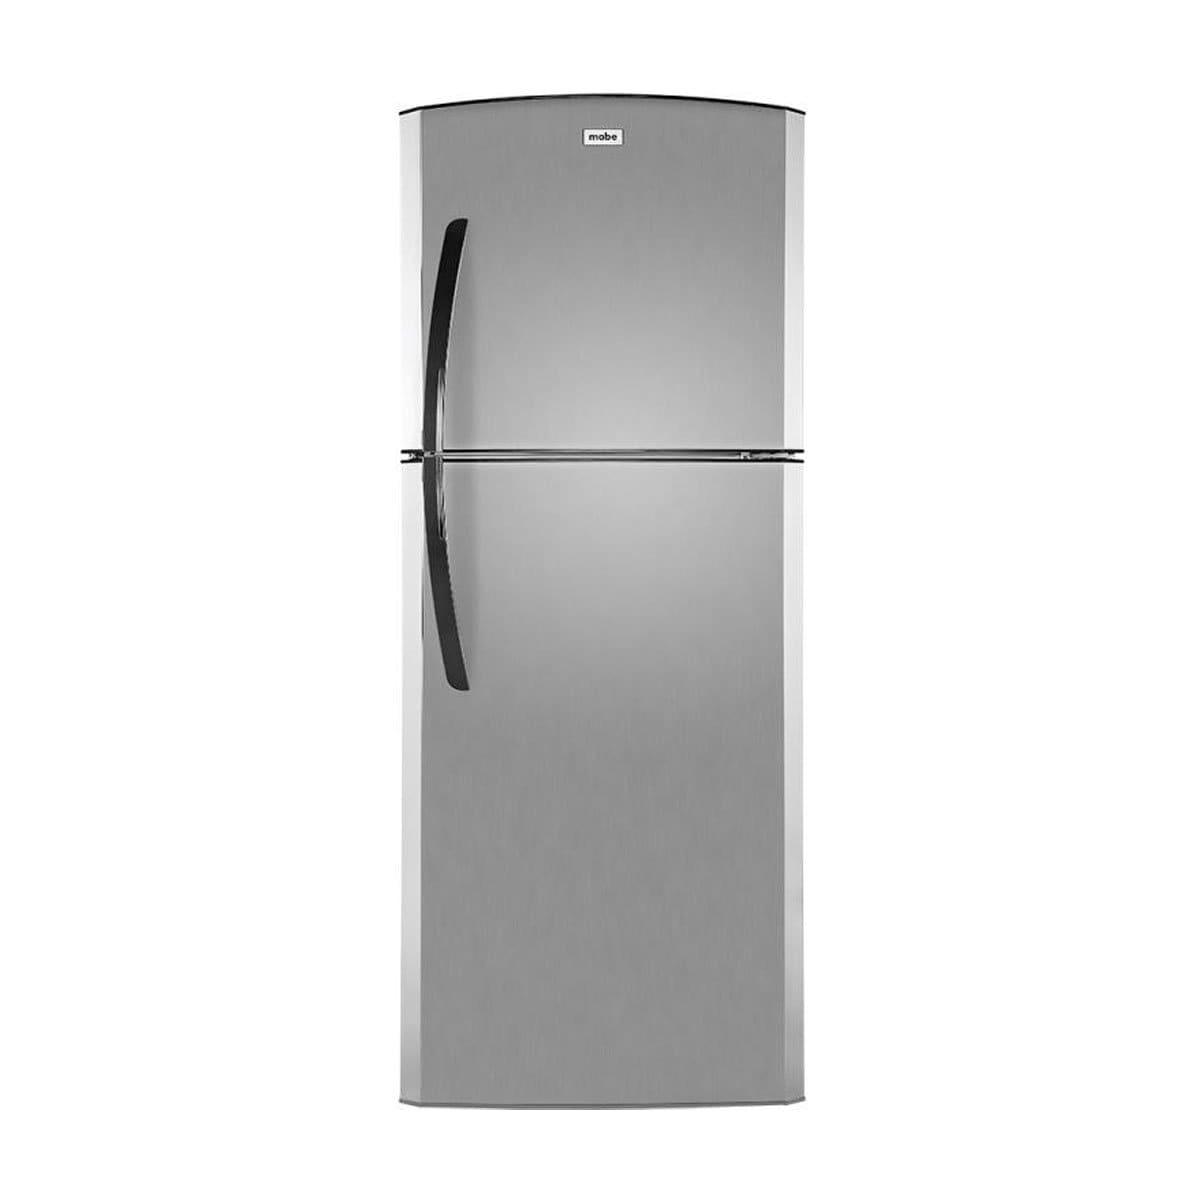 Refrigerador 2 Ptas 14 Pies Rme1436Xmxe0 Grafito Mabe